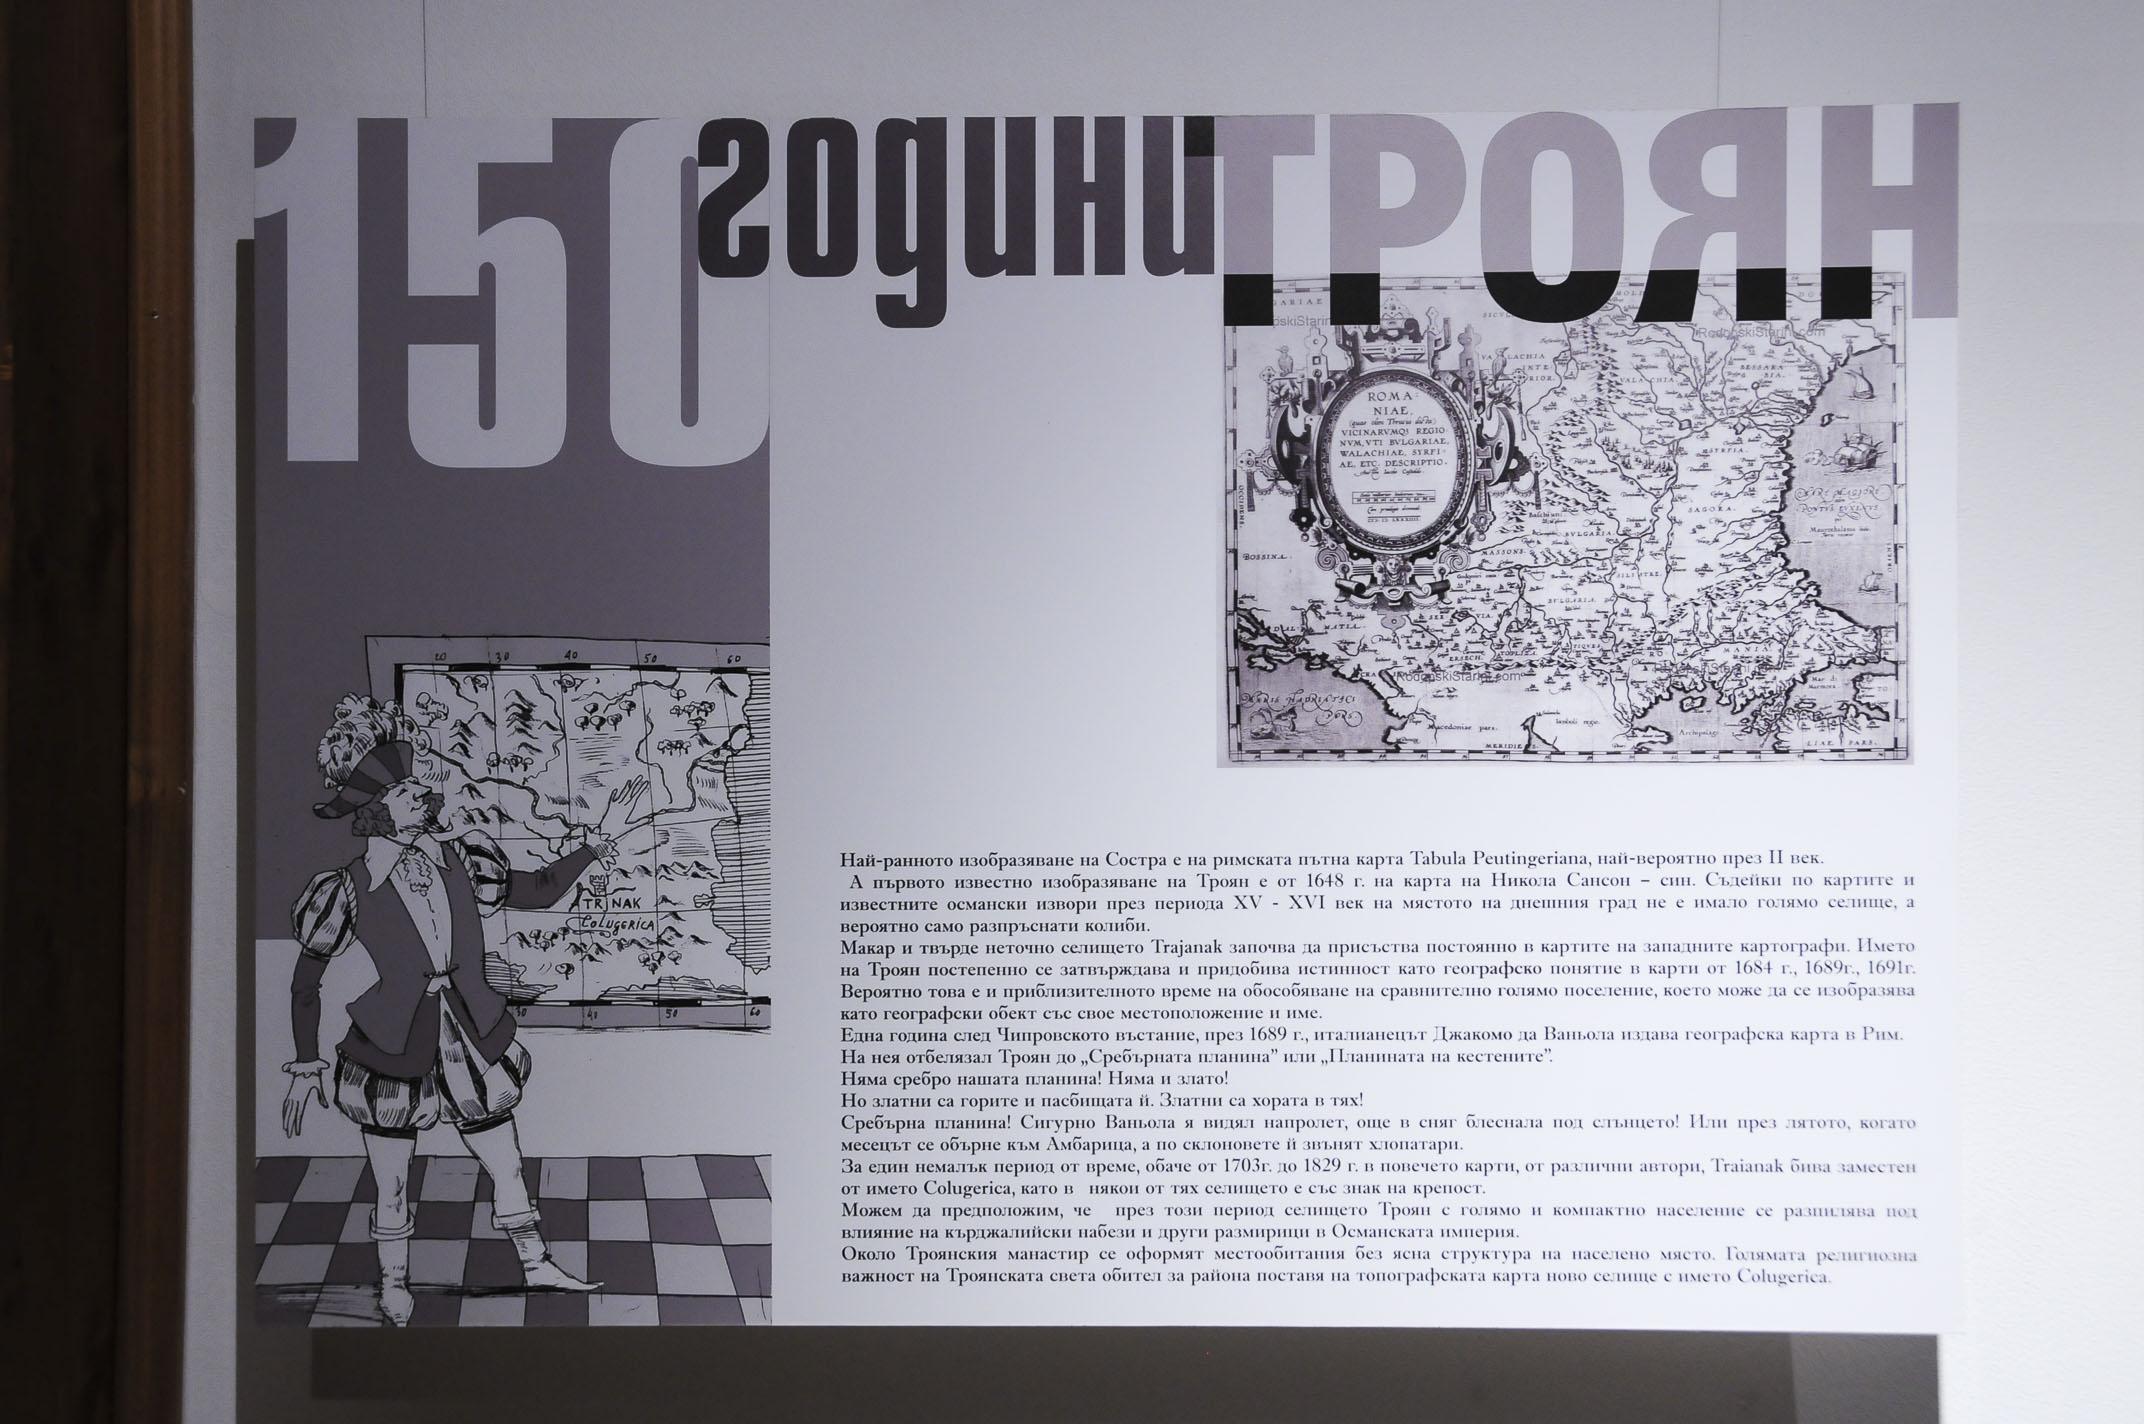 troyan-museum-provincialna-hronika-2